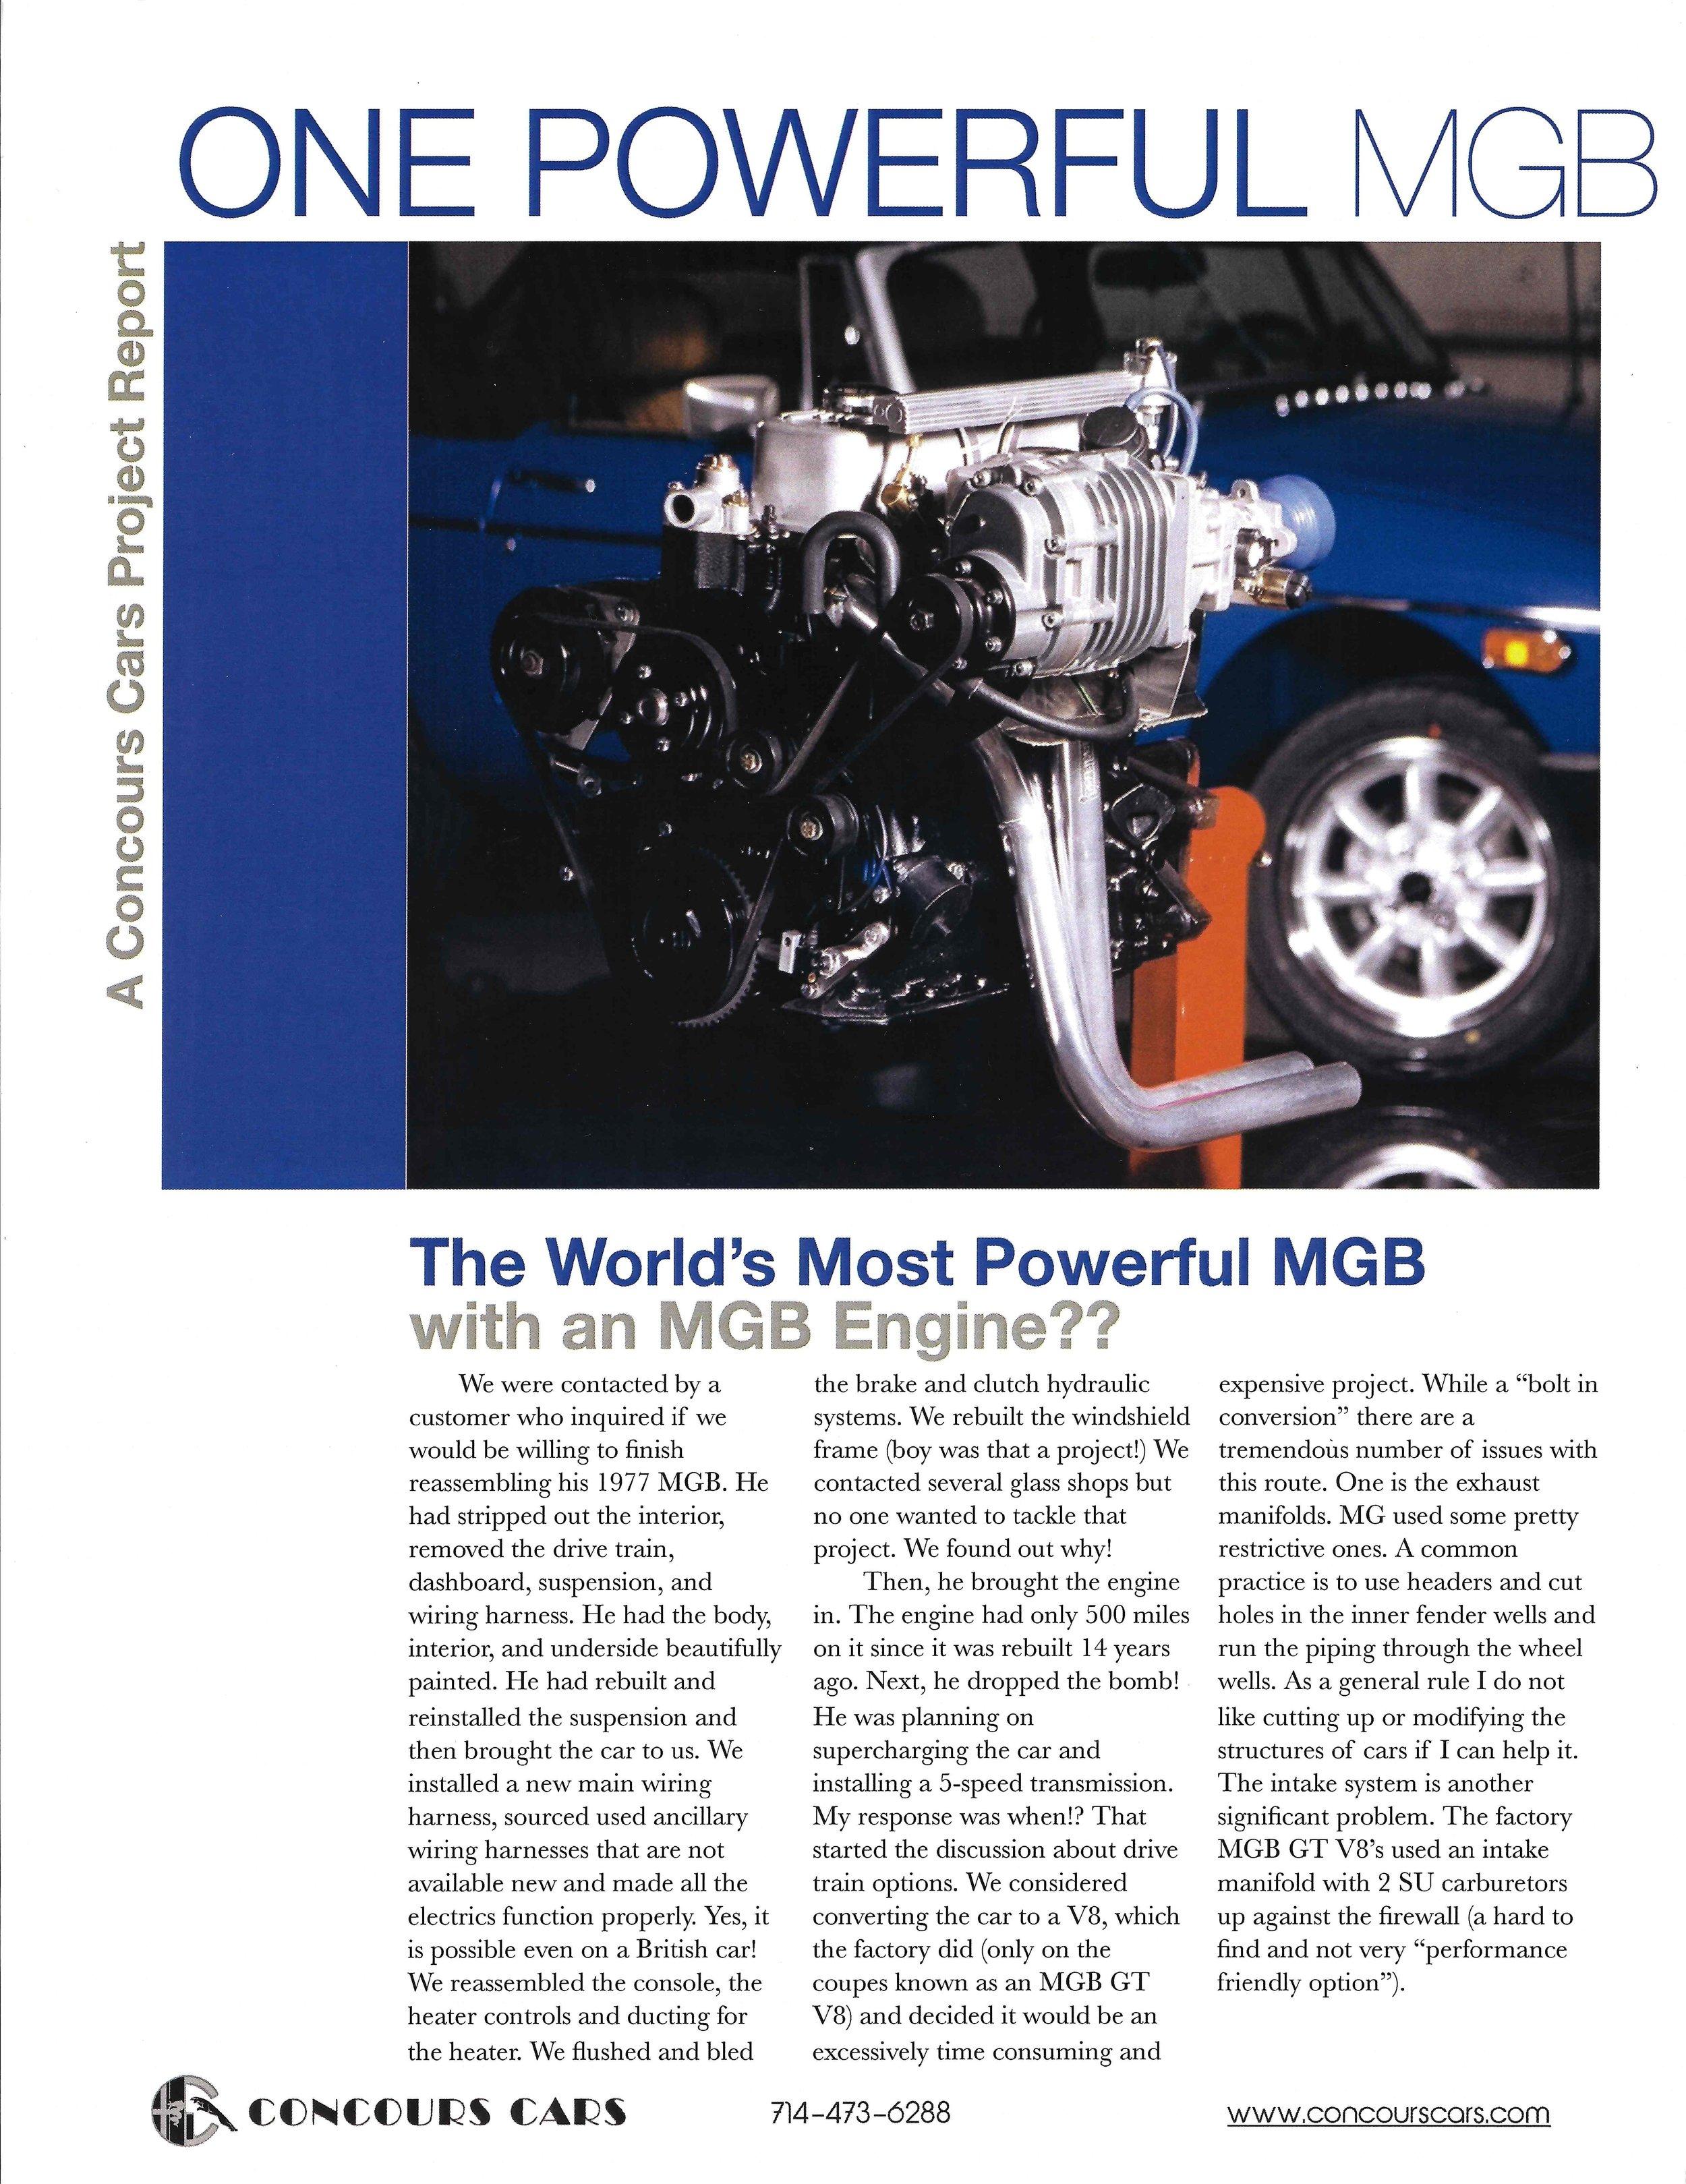 Mgb1.jpg